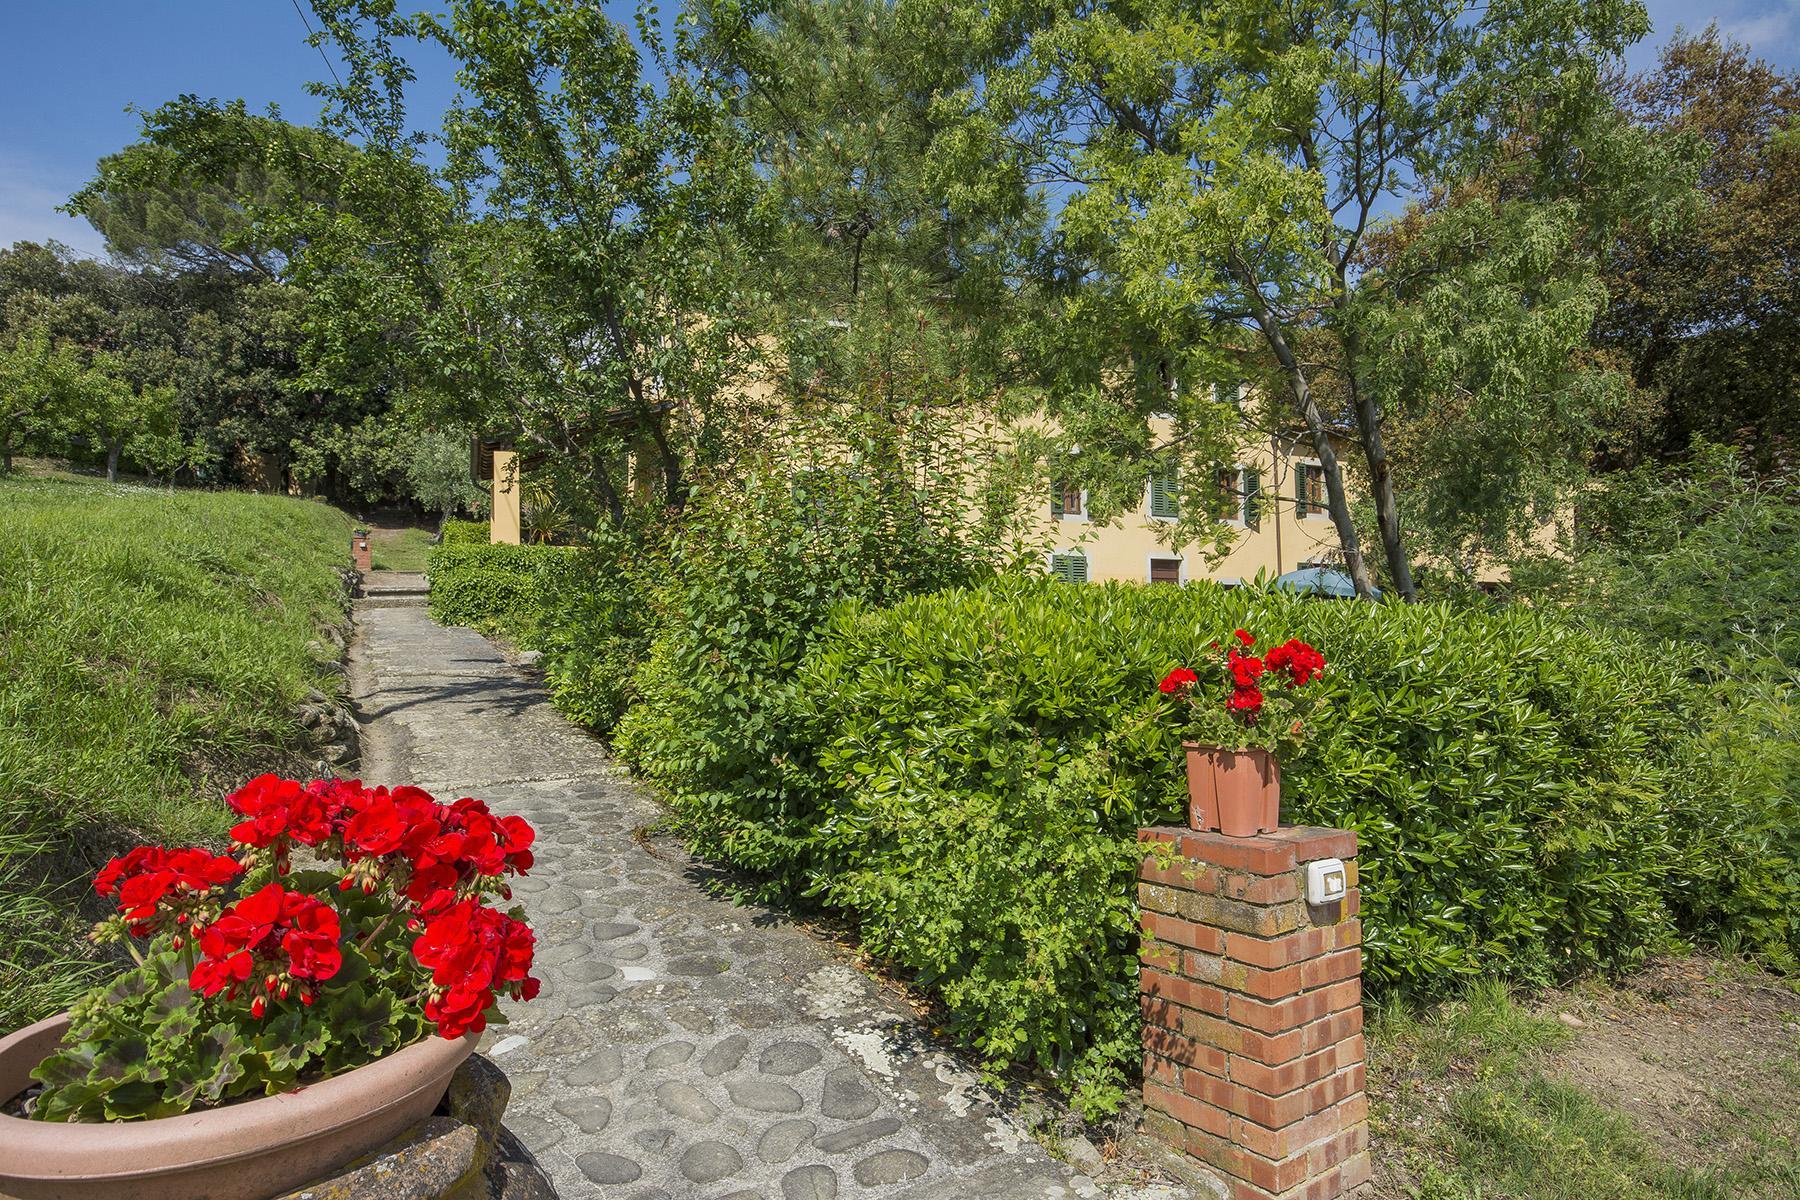 Pescia小山丘上美丽的乡间农舍 - 37